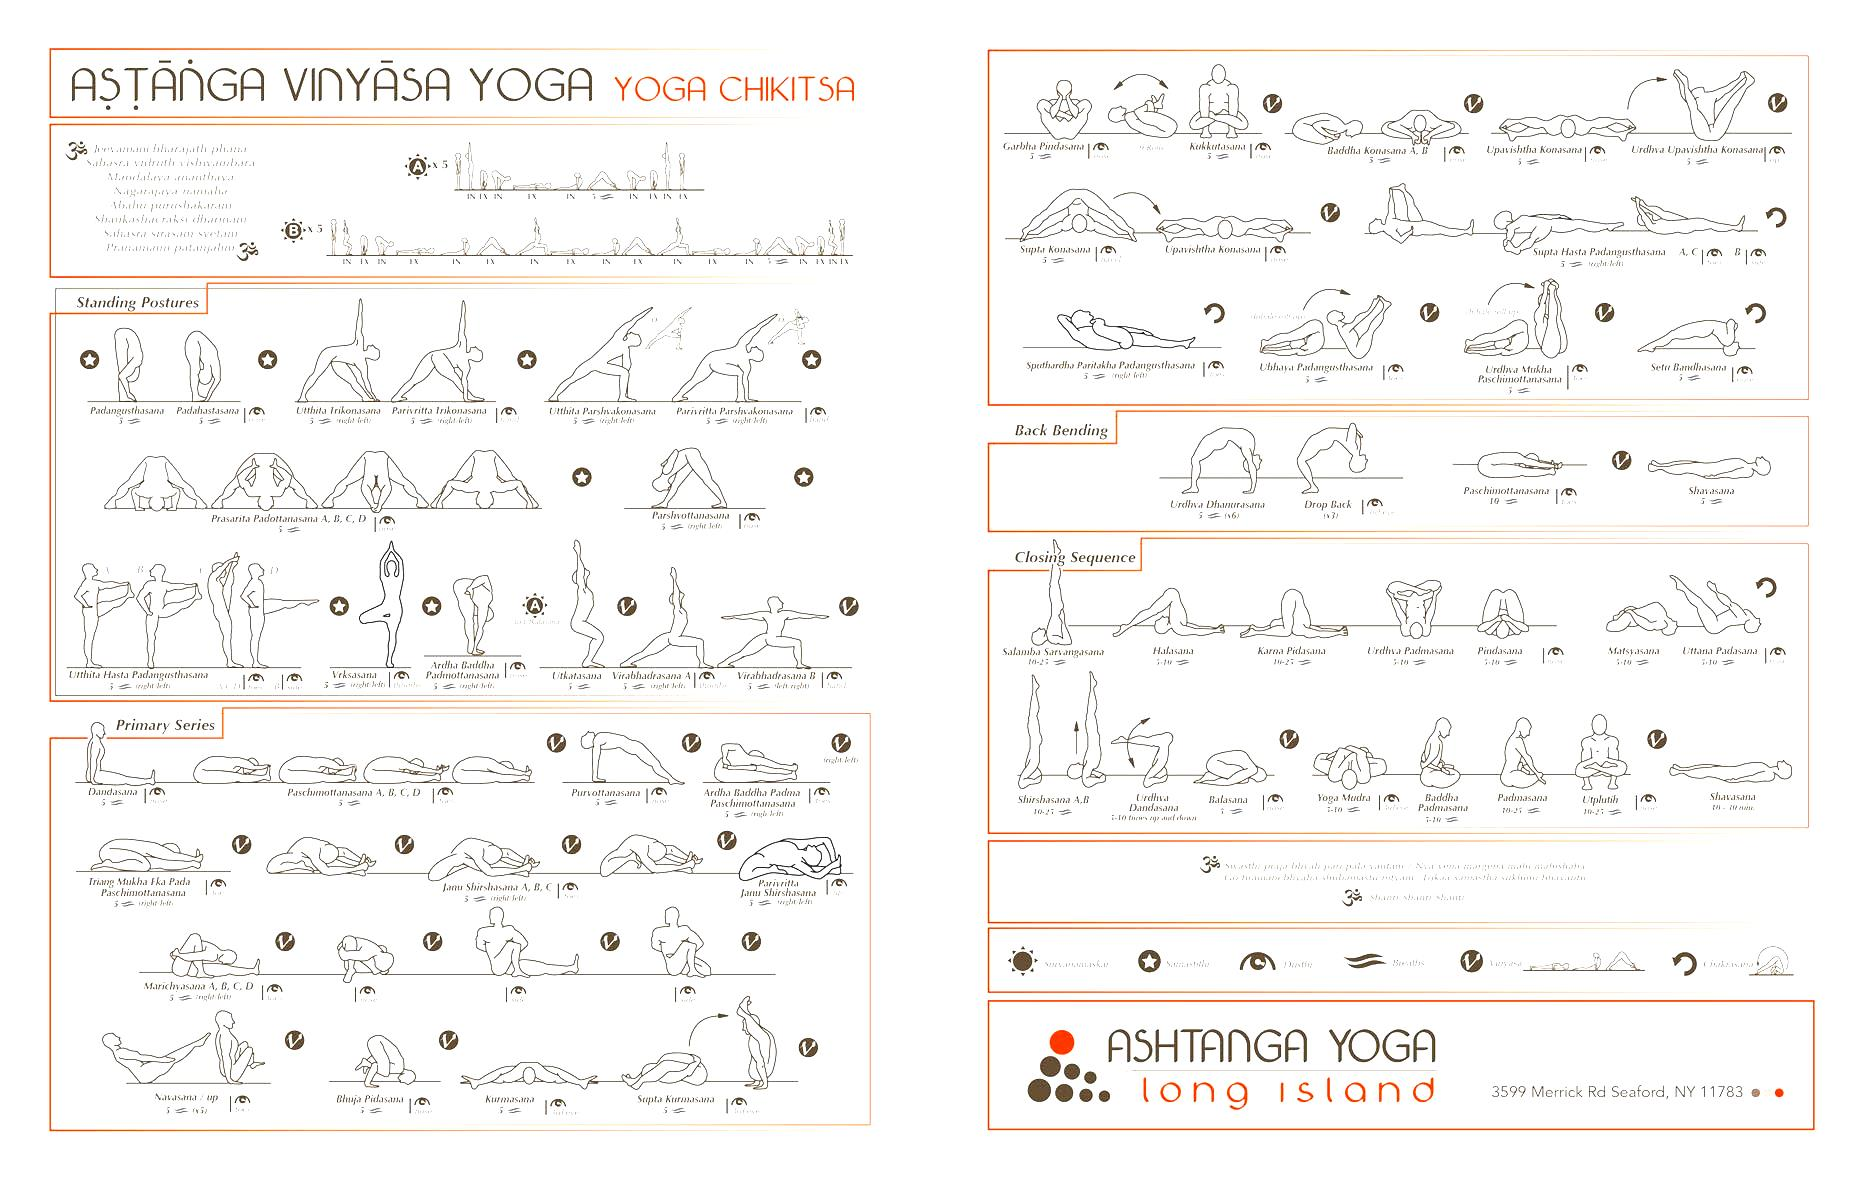 Printable 84 Hatha Yoga Postures Pdf Ardusat Org